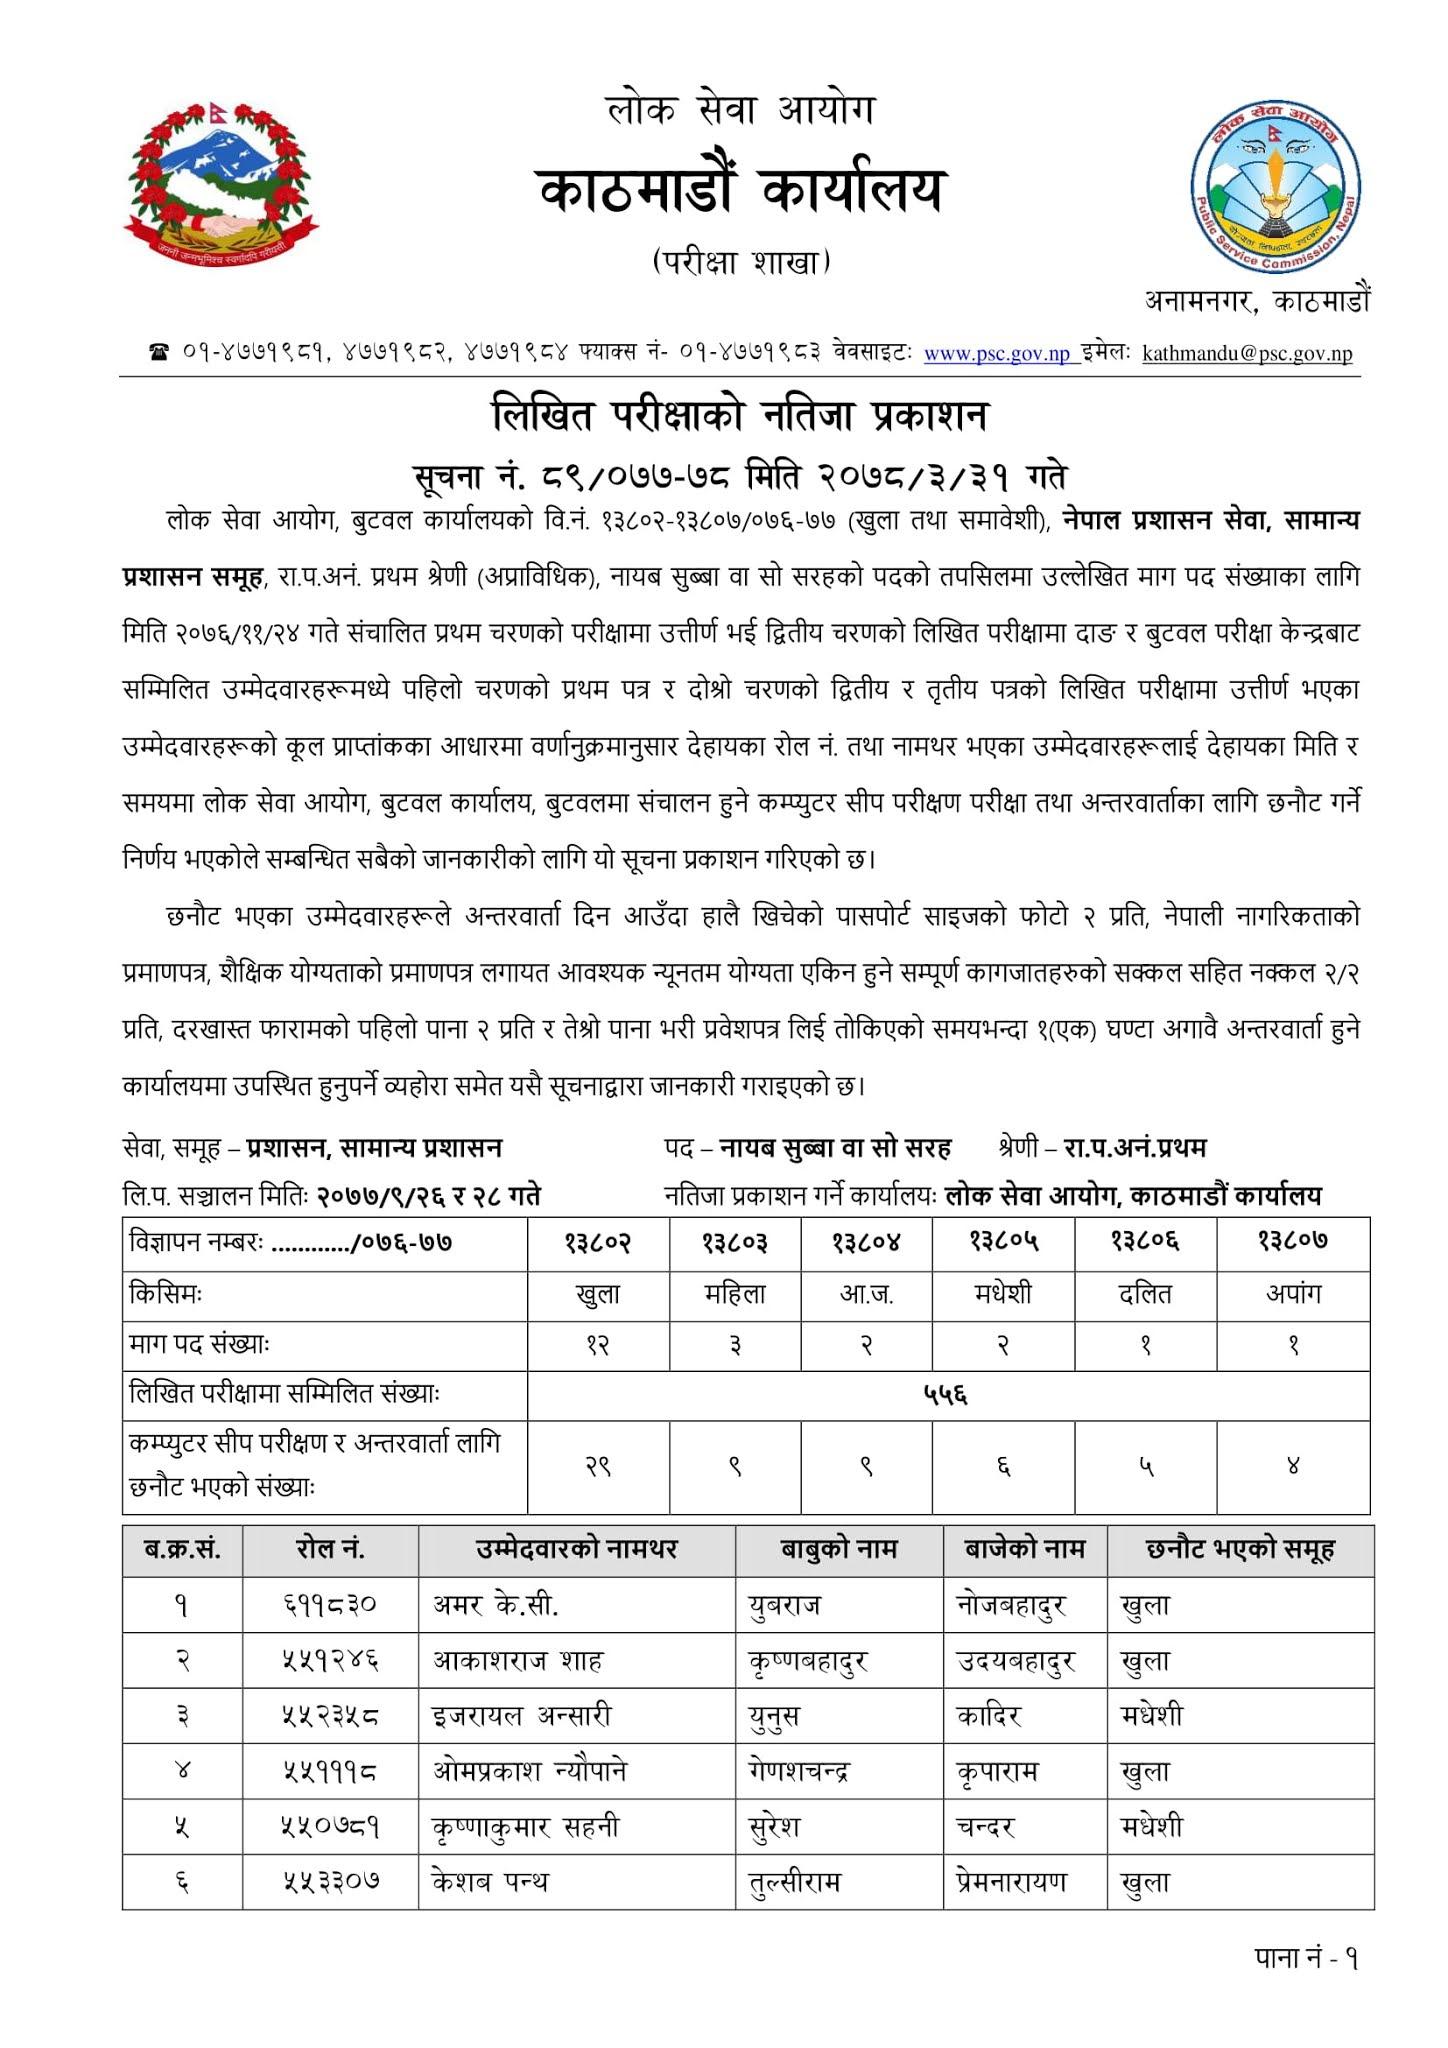 NASU Admin - Butwal Lok Sewa Aayog Written Exam Result & Exam Schedule